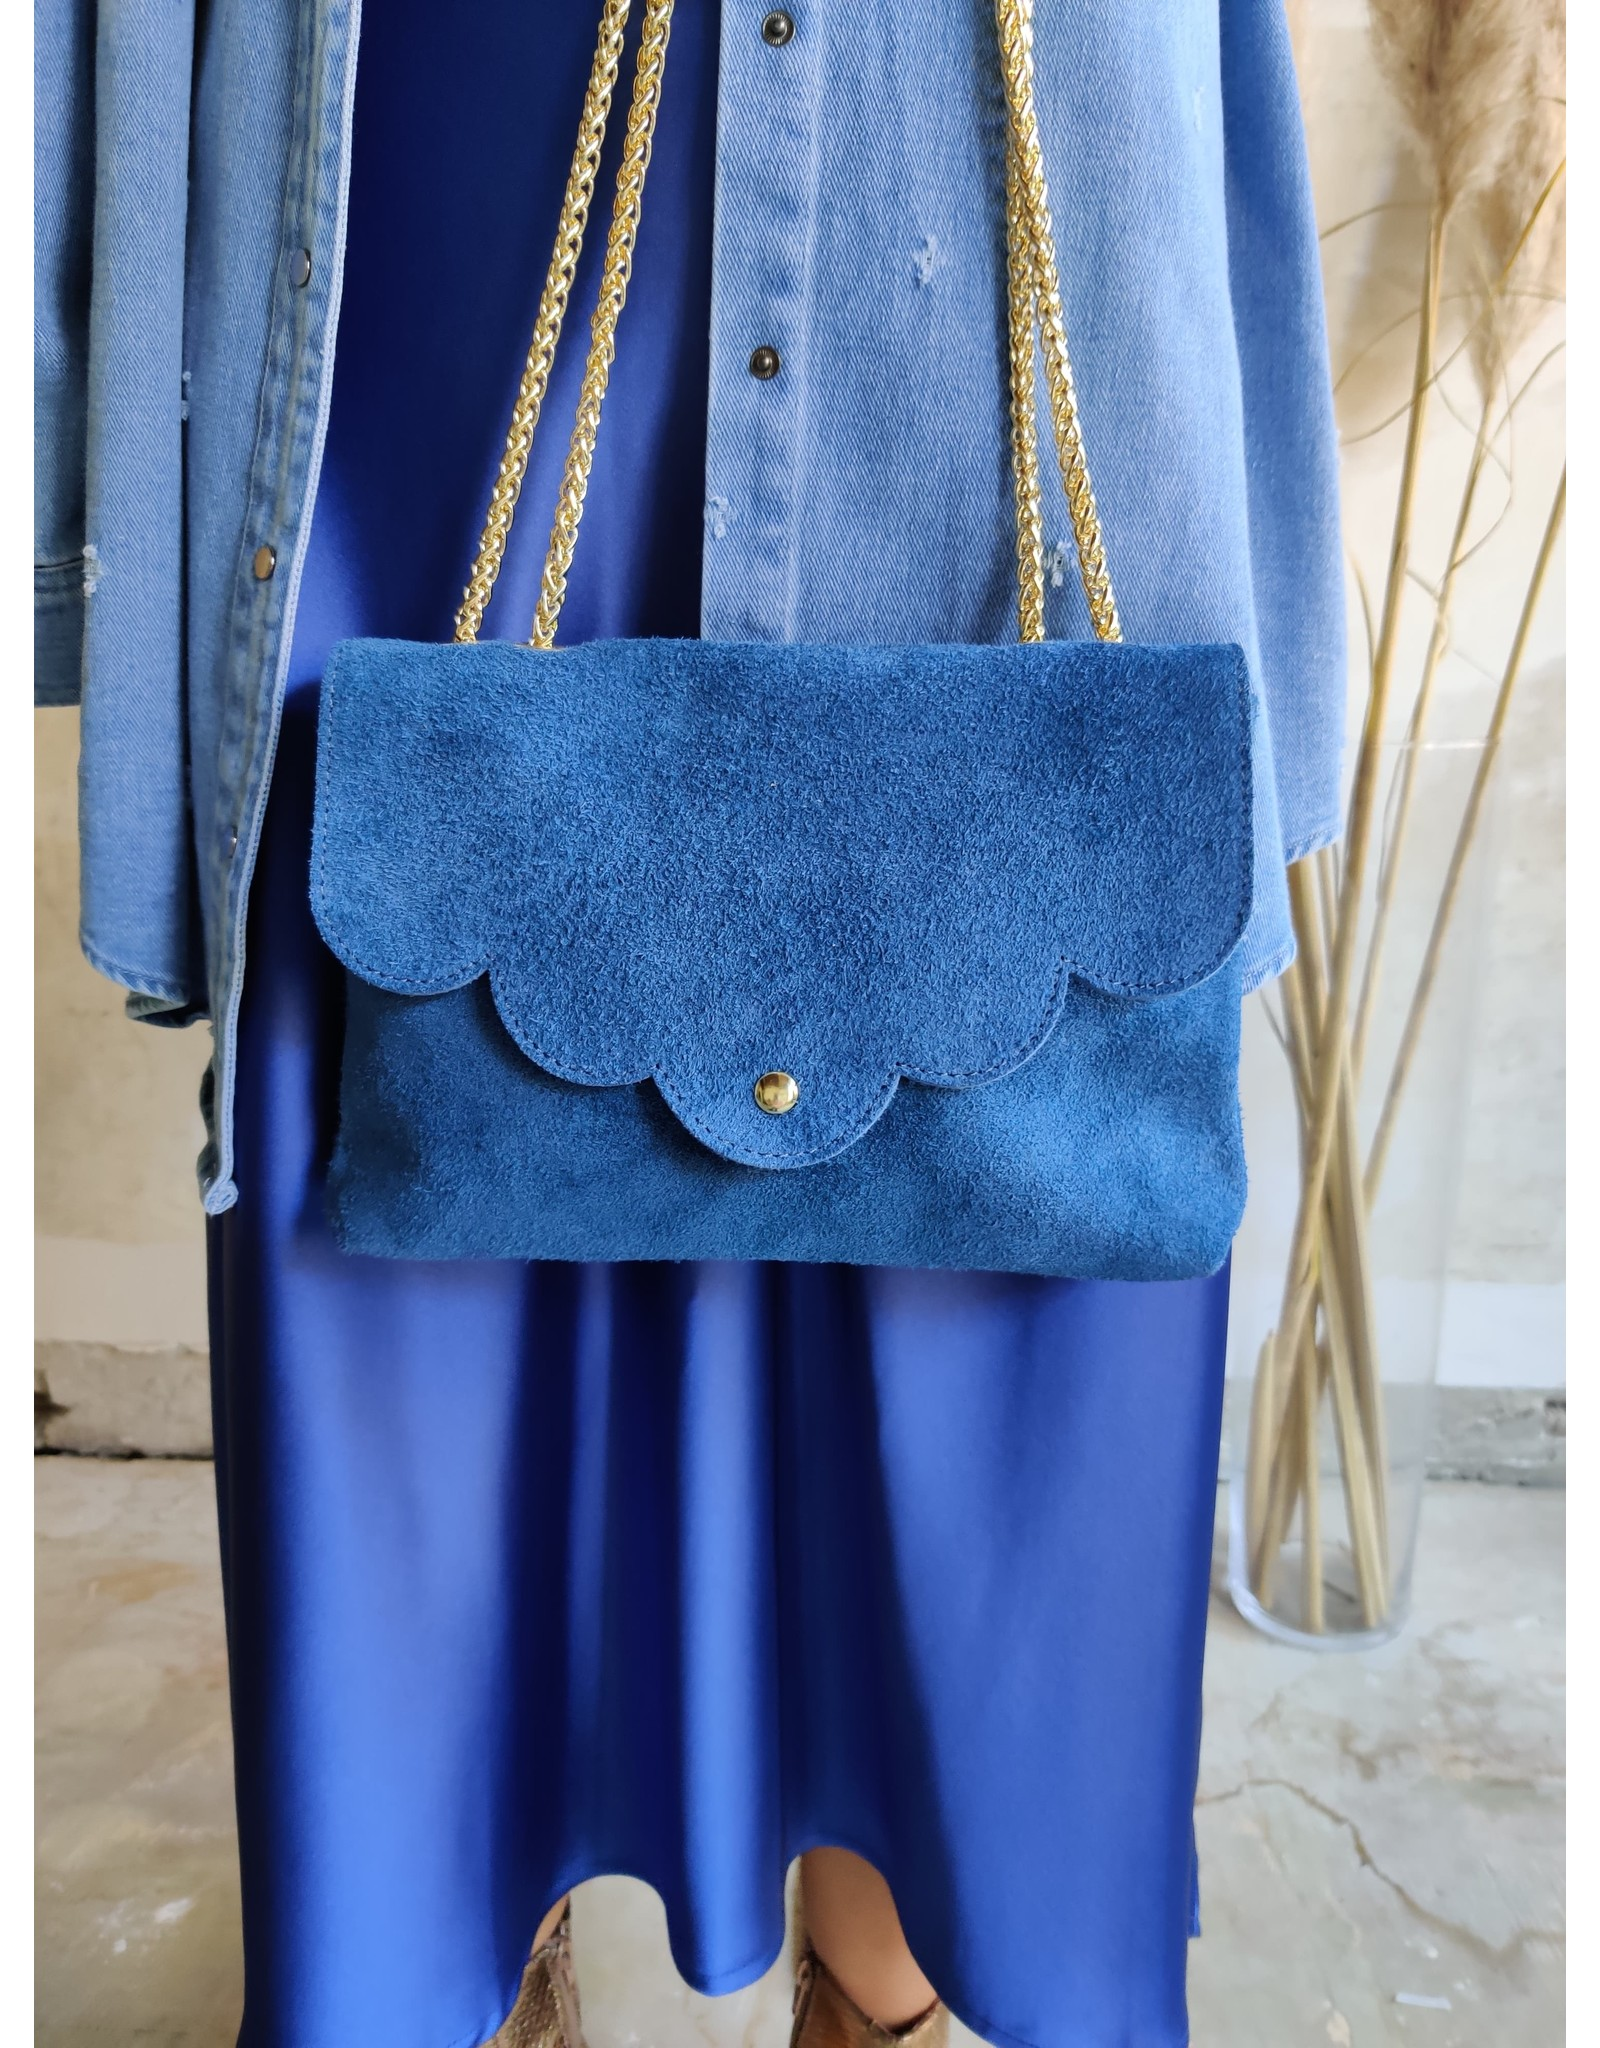 SUEDE BAG BLUE